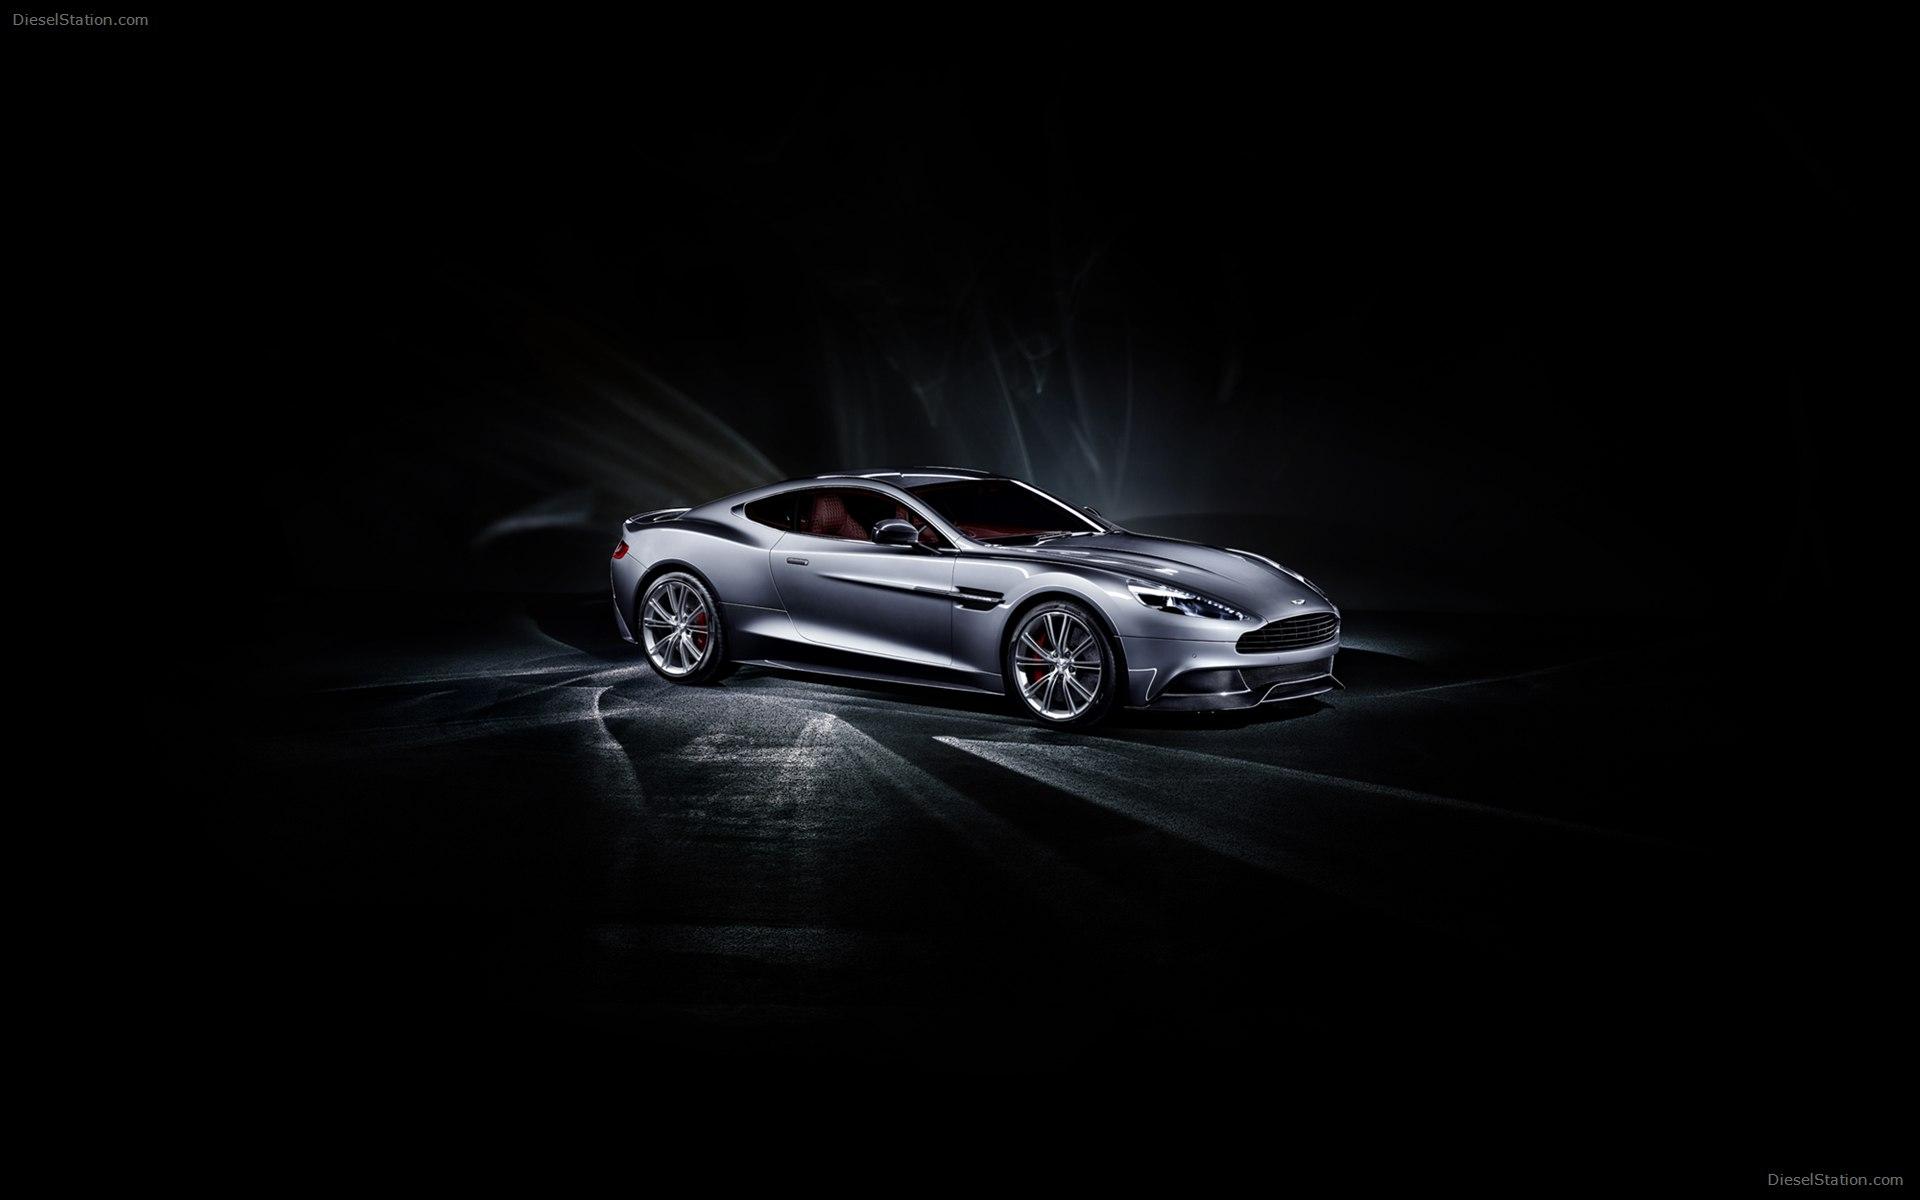 Home Aston Martin Aston Martin Vanquish 2014 1920x1200